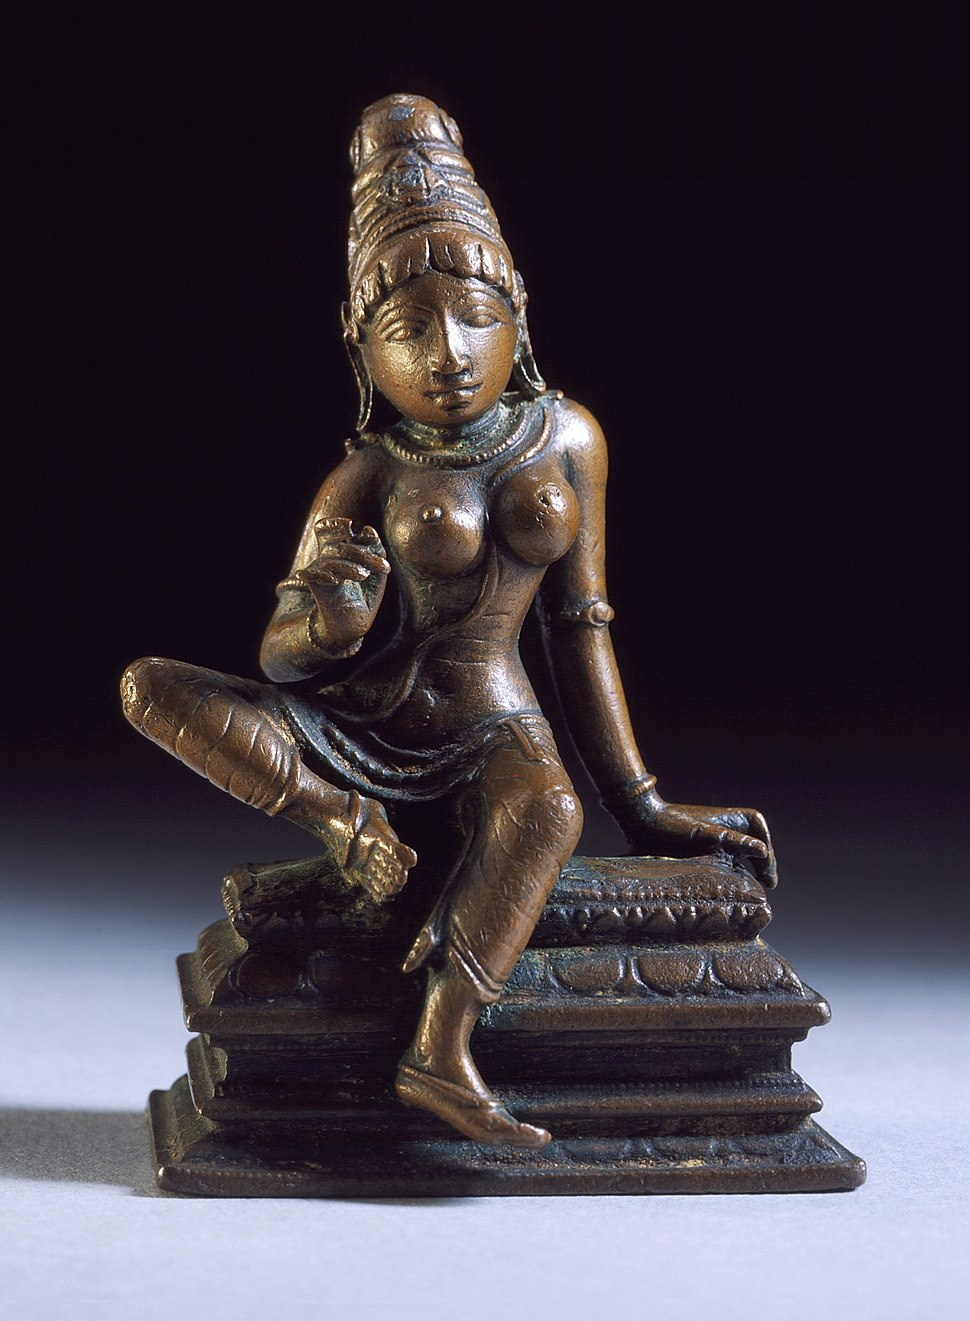 The Hindu Goddess Parvati LACMA M.72.1.14 (1 of 2)